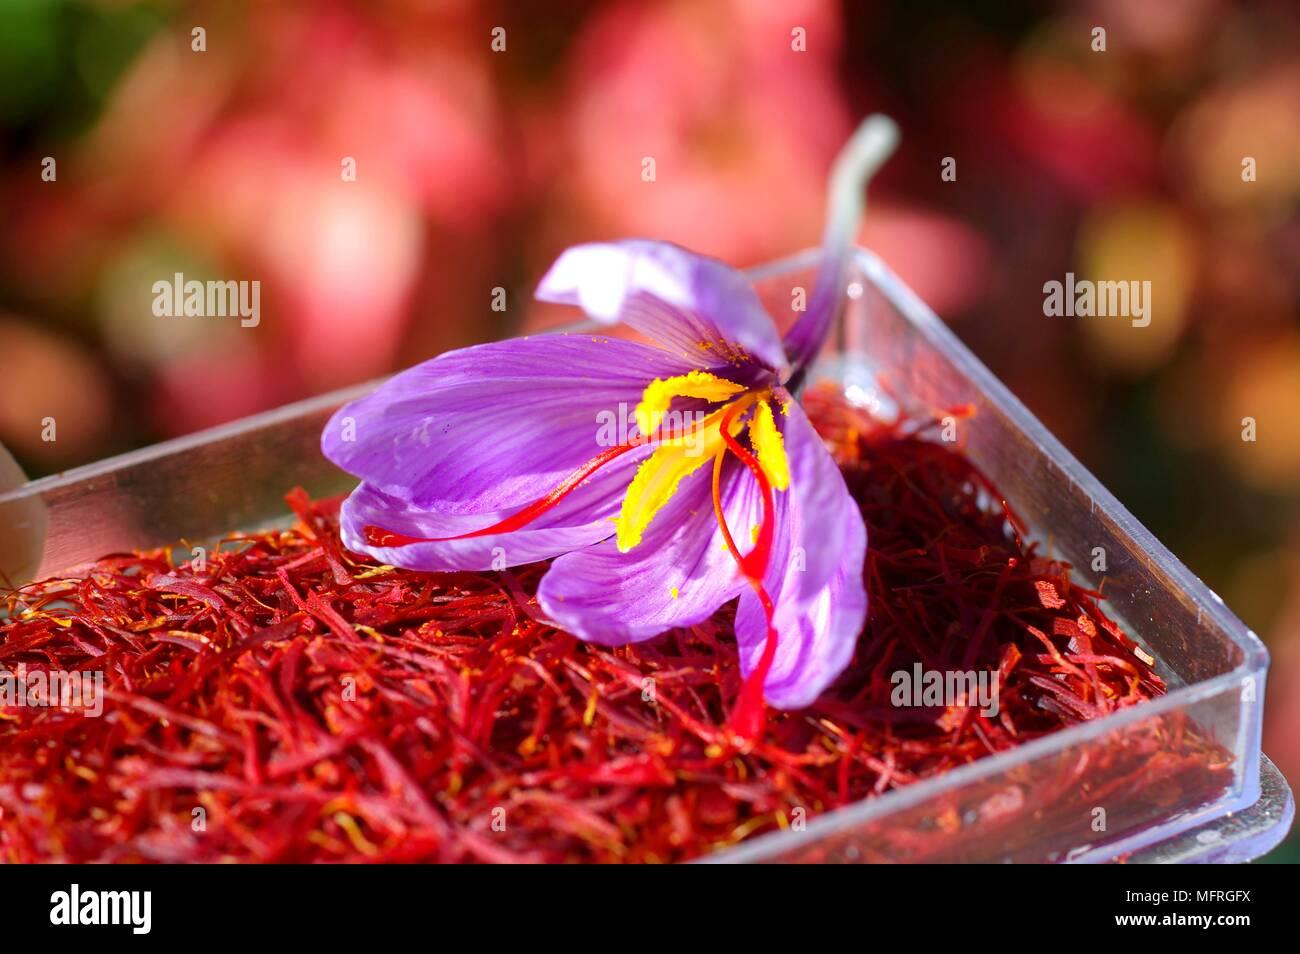 Saffron Flower Stock Photo 181841406 Alamy